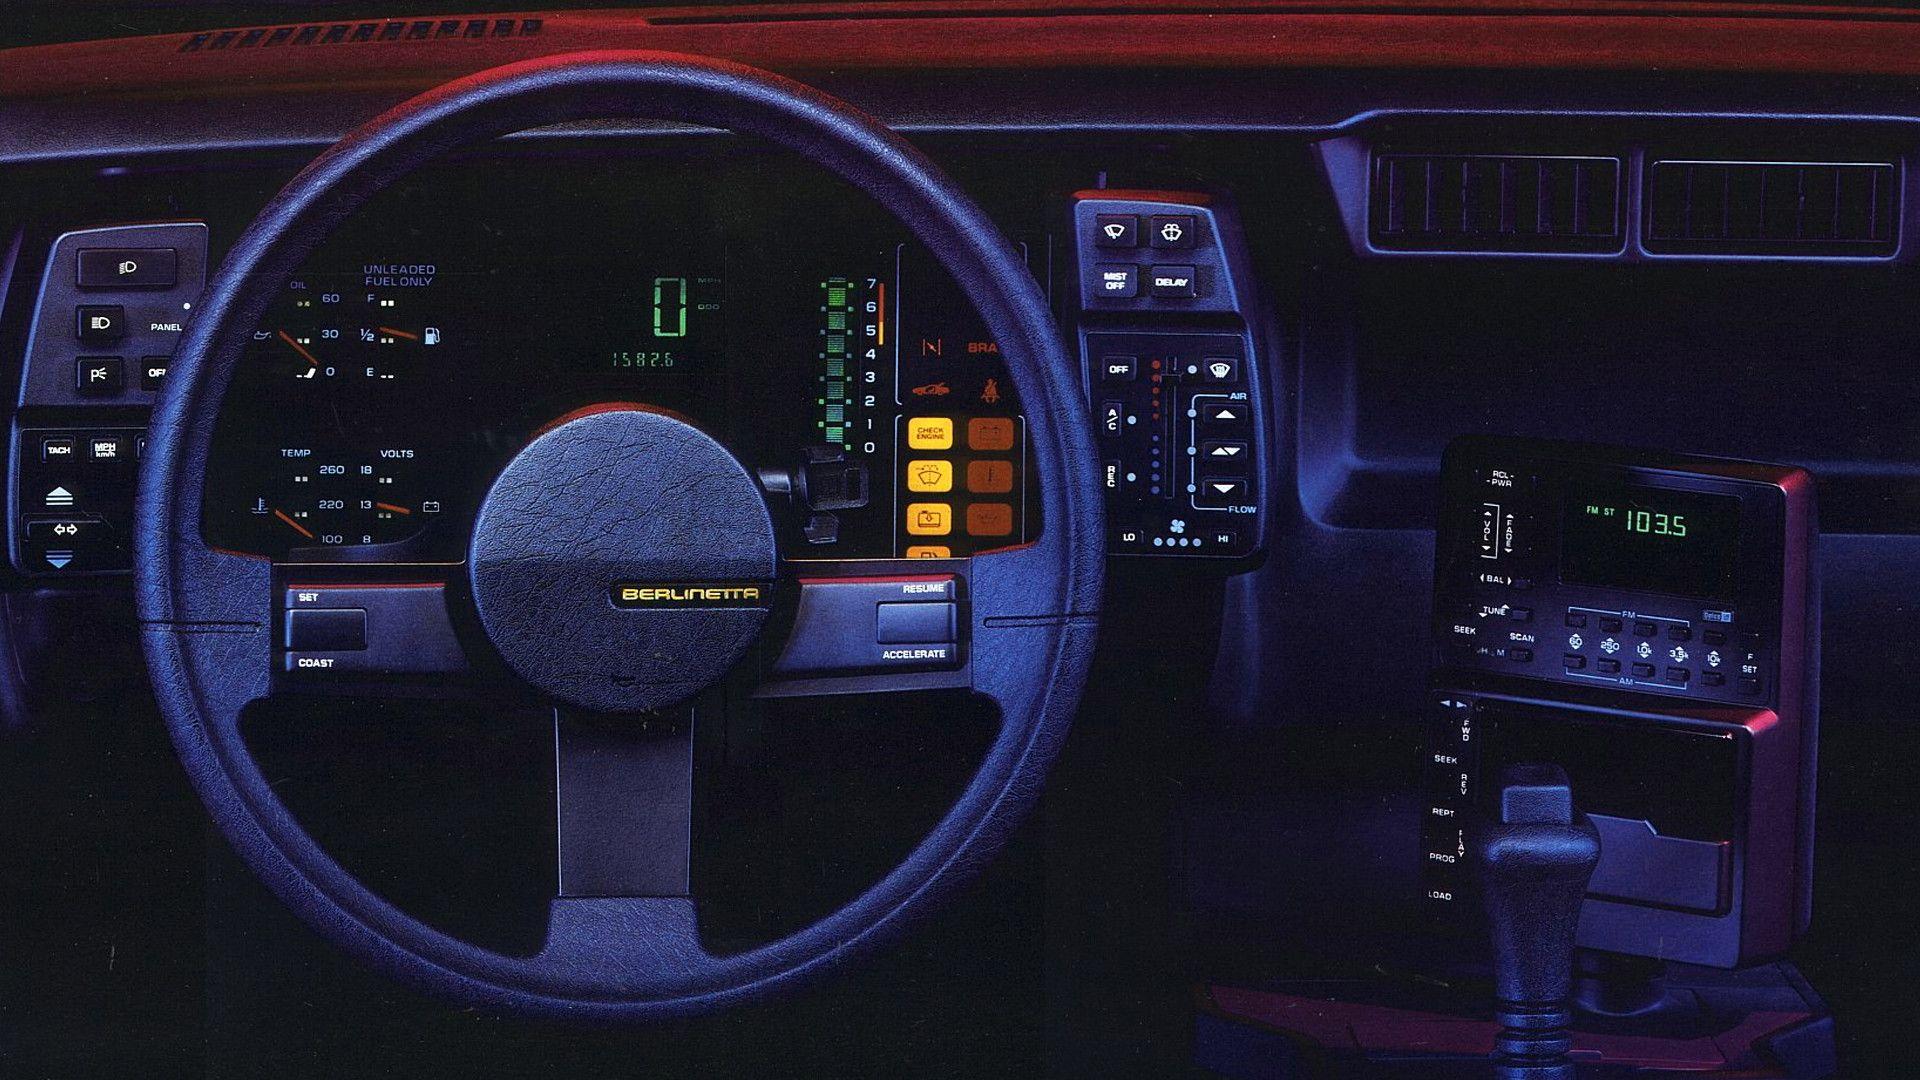 berlinetta console retrowave synthwave 80s neon electro retro neon outrun. Black Bedroom Furniture Sets. Home Design Ideas